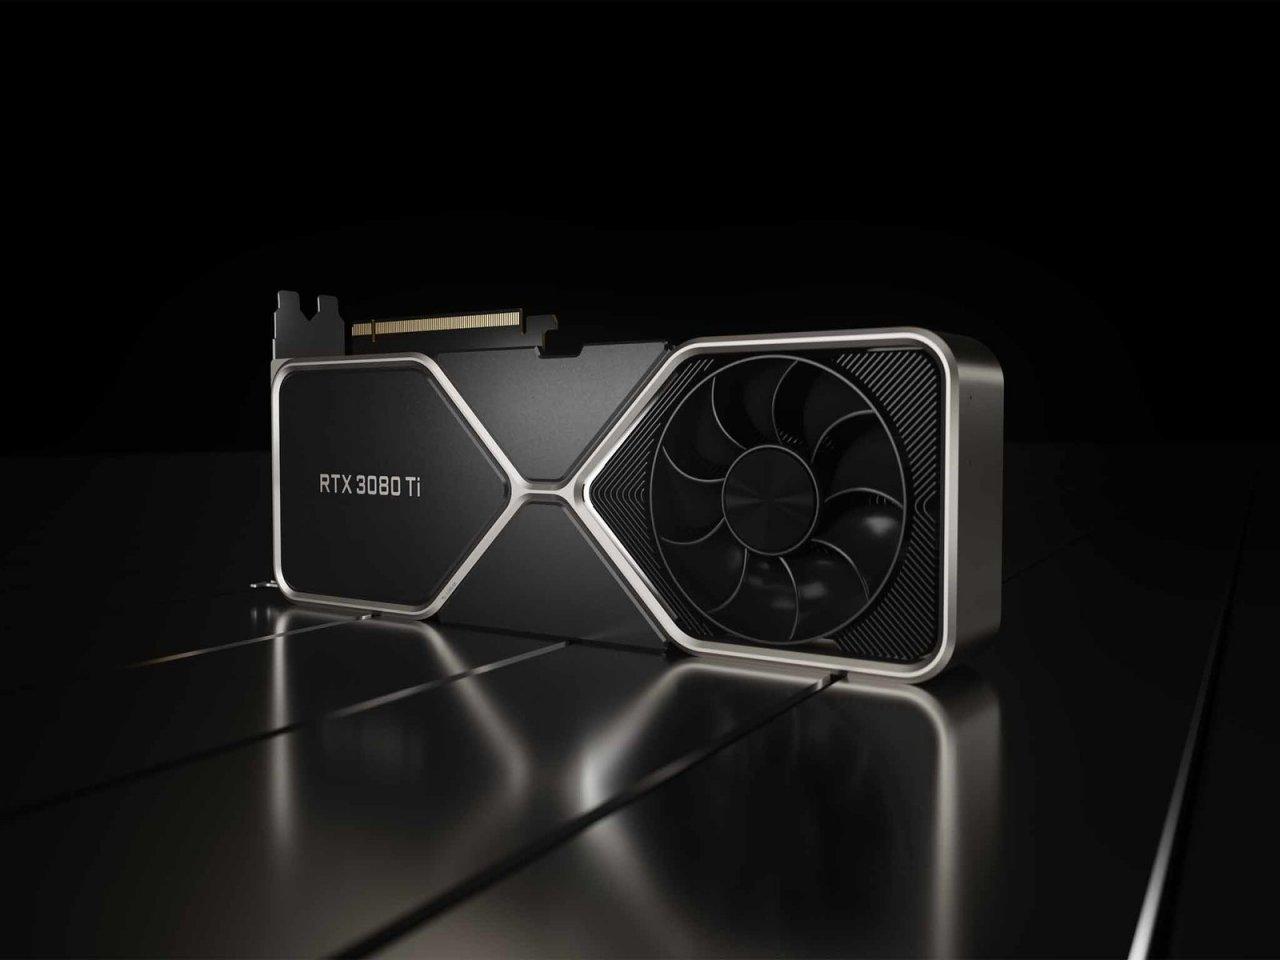 NVIDIA представила графические процессоры GeForce RTX 3080 Ti и RTX 3070 Ti